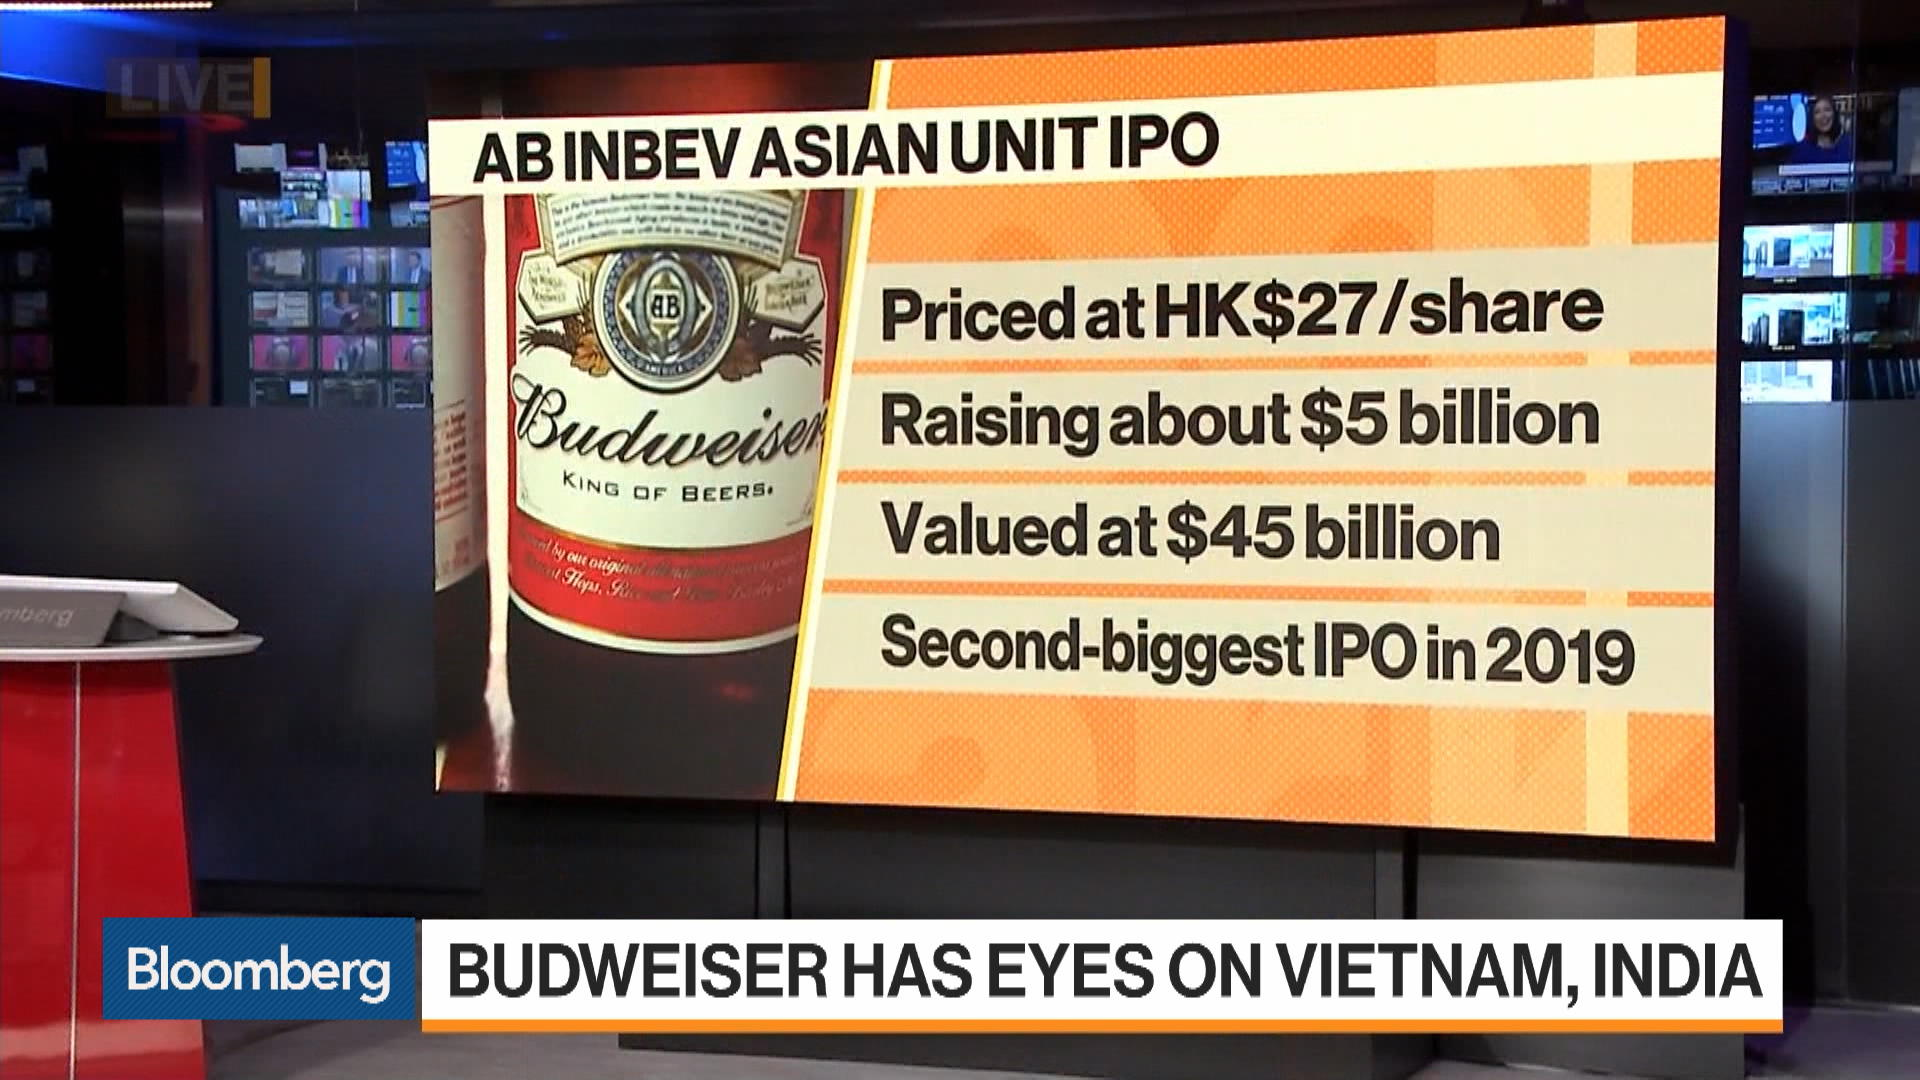 AB InBev's Asia Unit Rises in Hong Kong Trading Debut